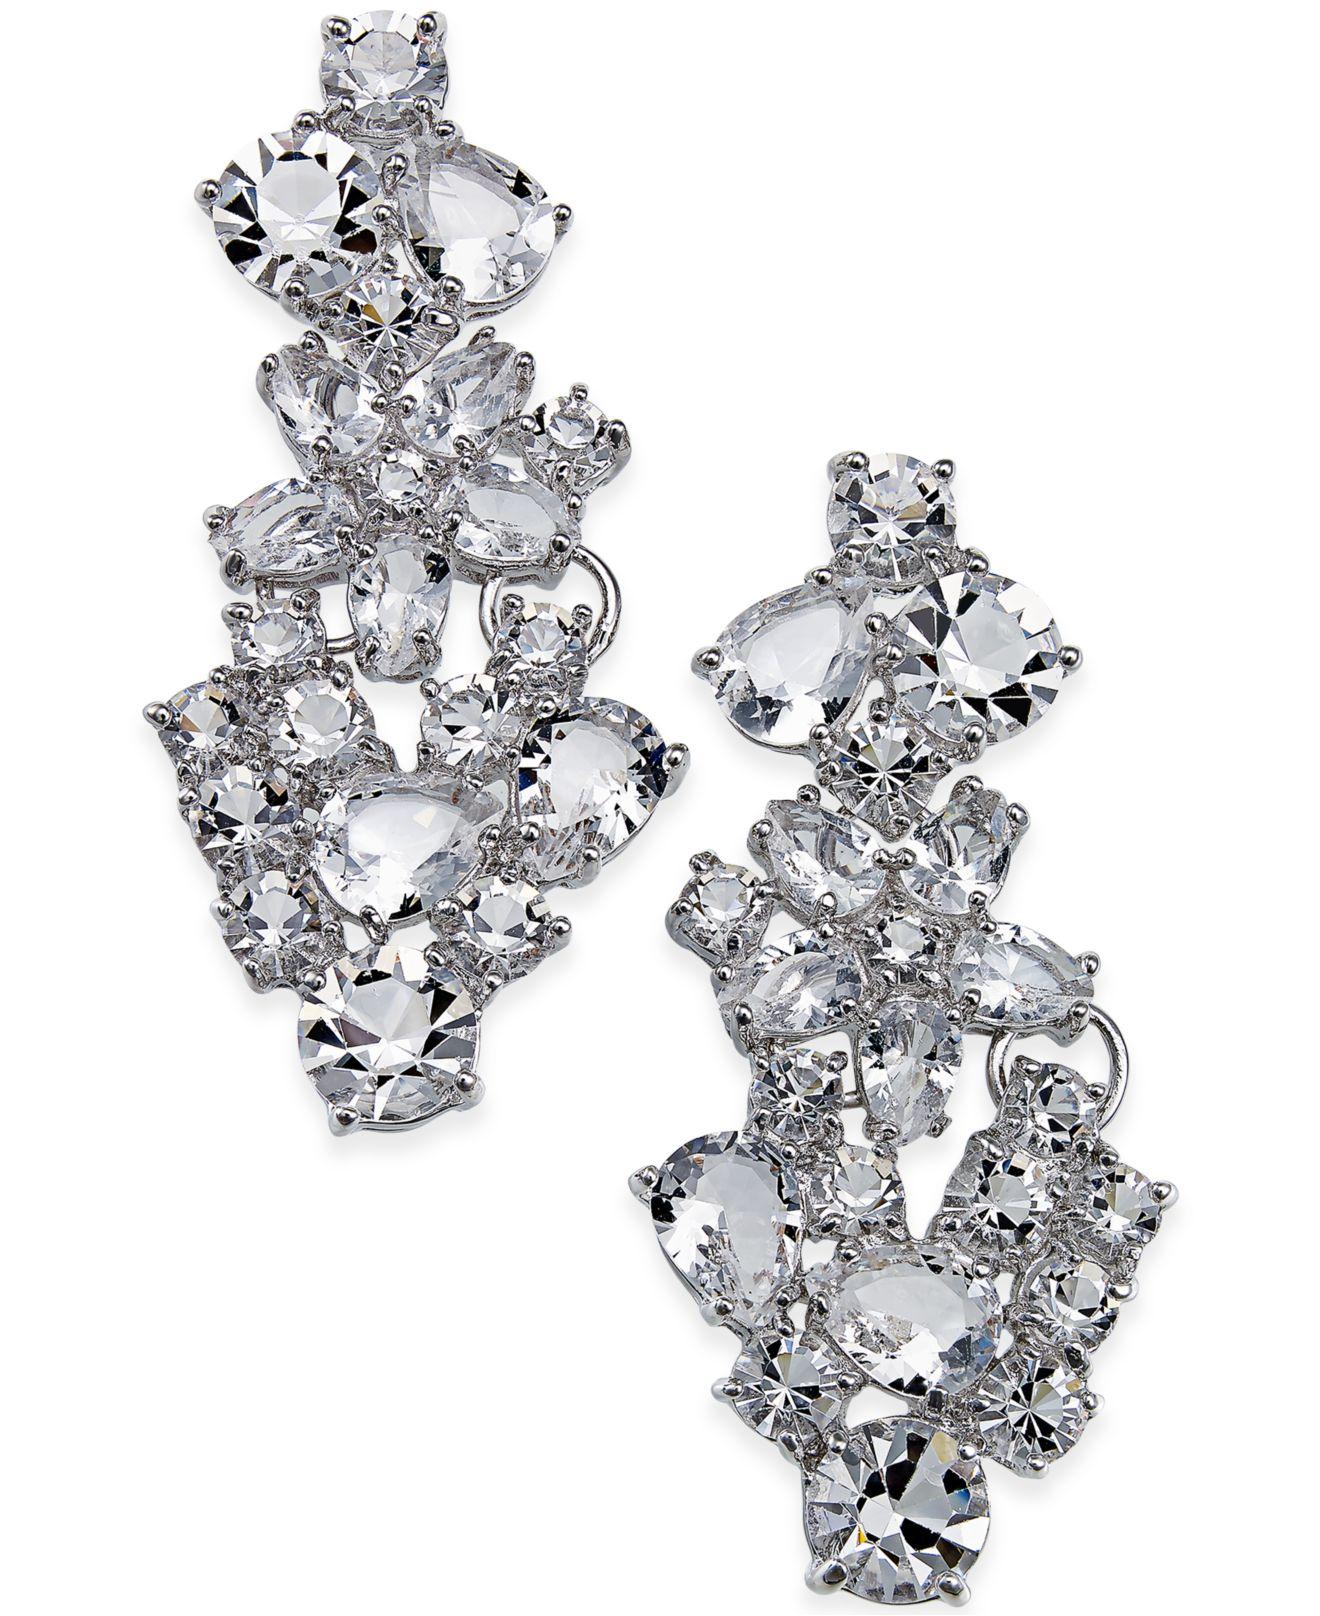 aead0c71c22de kate spade new york Multicolor Boathouse Crystal Statement Earrings